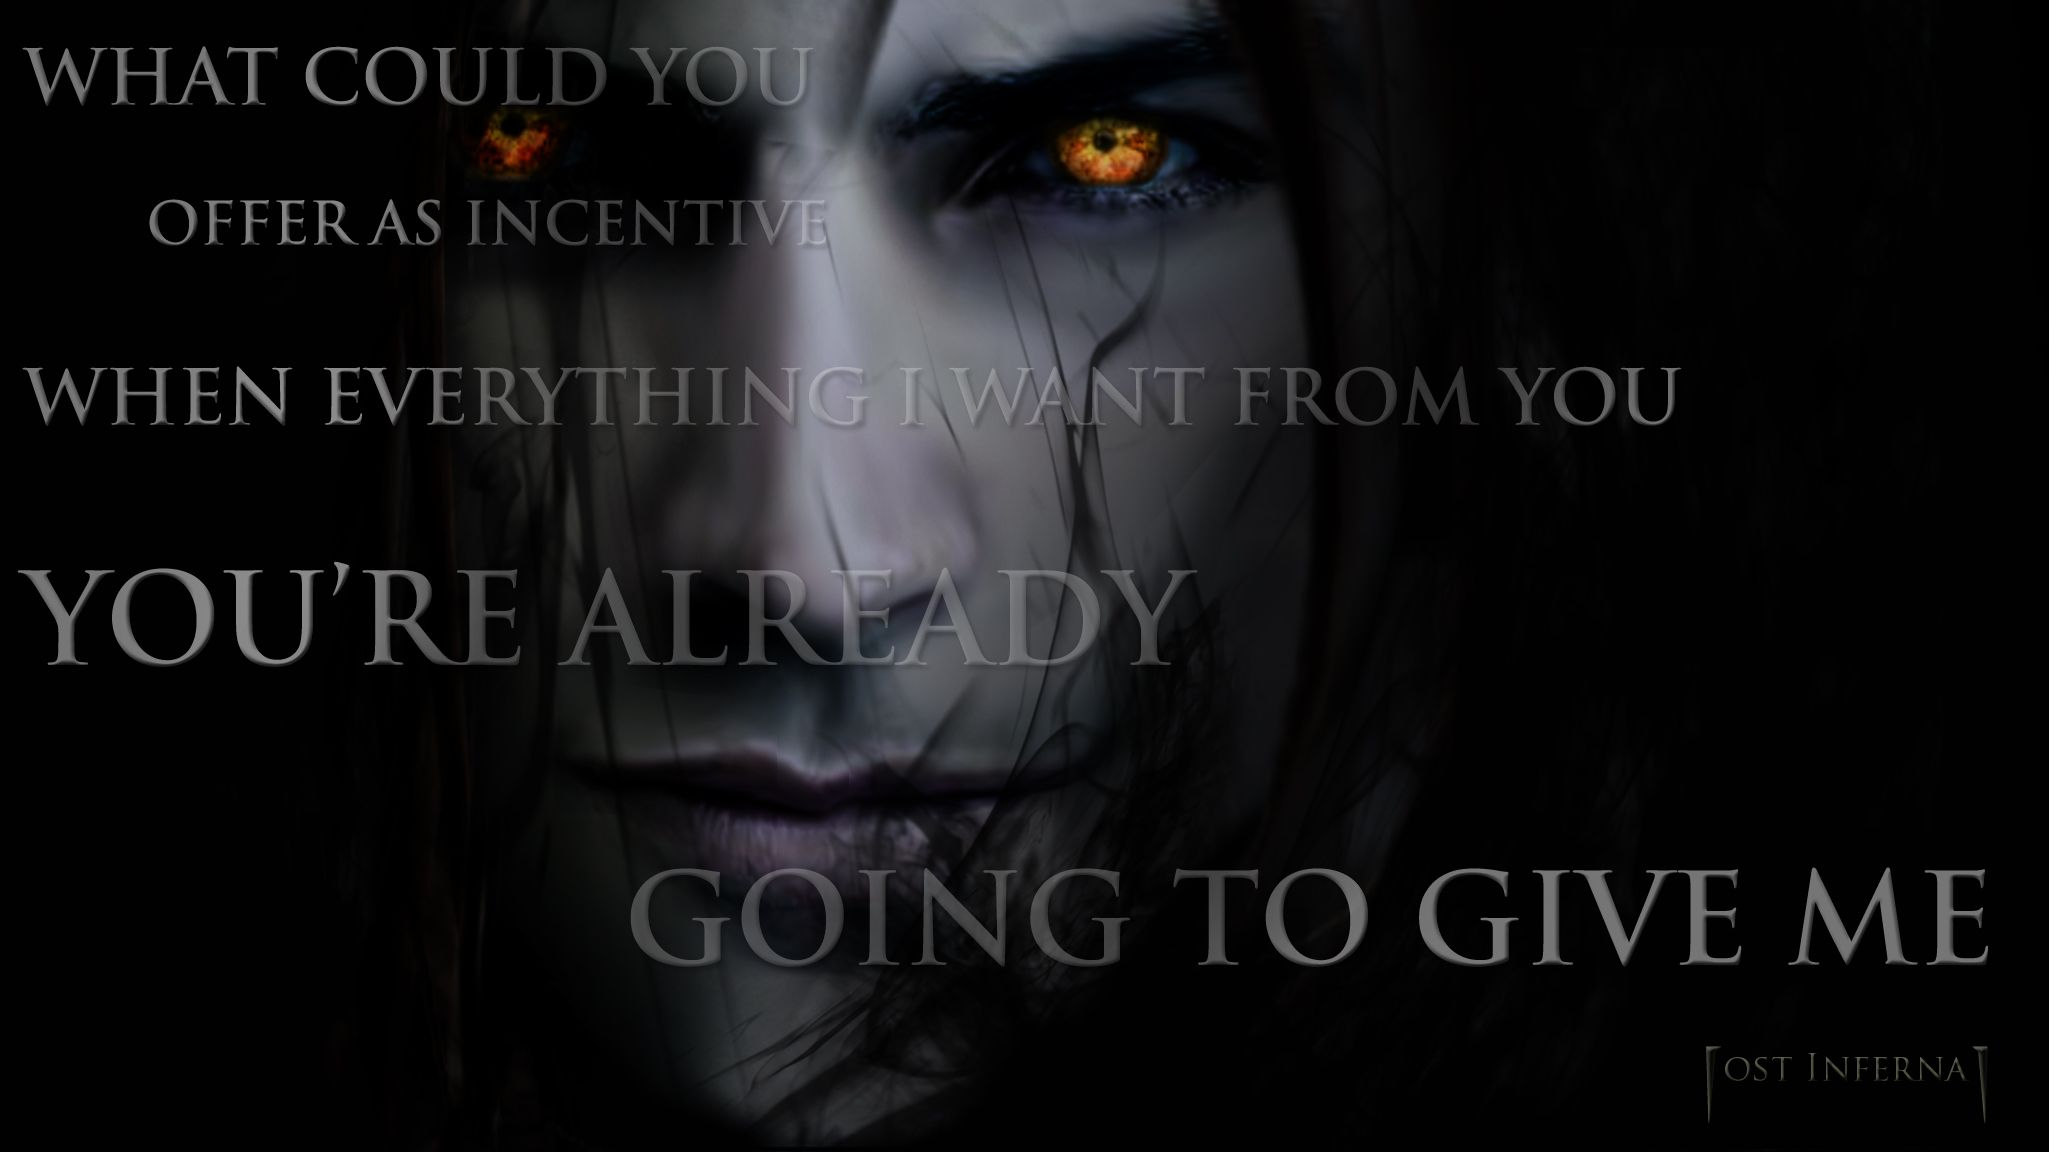 Vampires | ... - Lost Infernal - Vampires Photo (34182725 ...